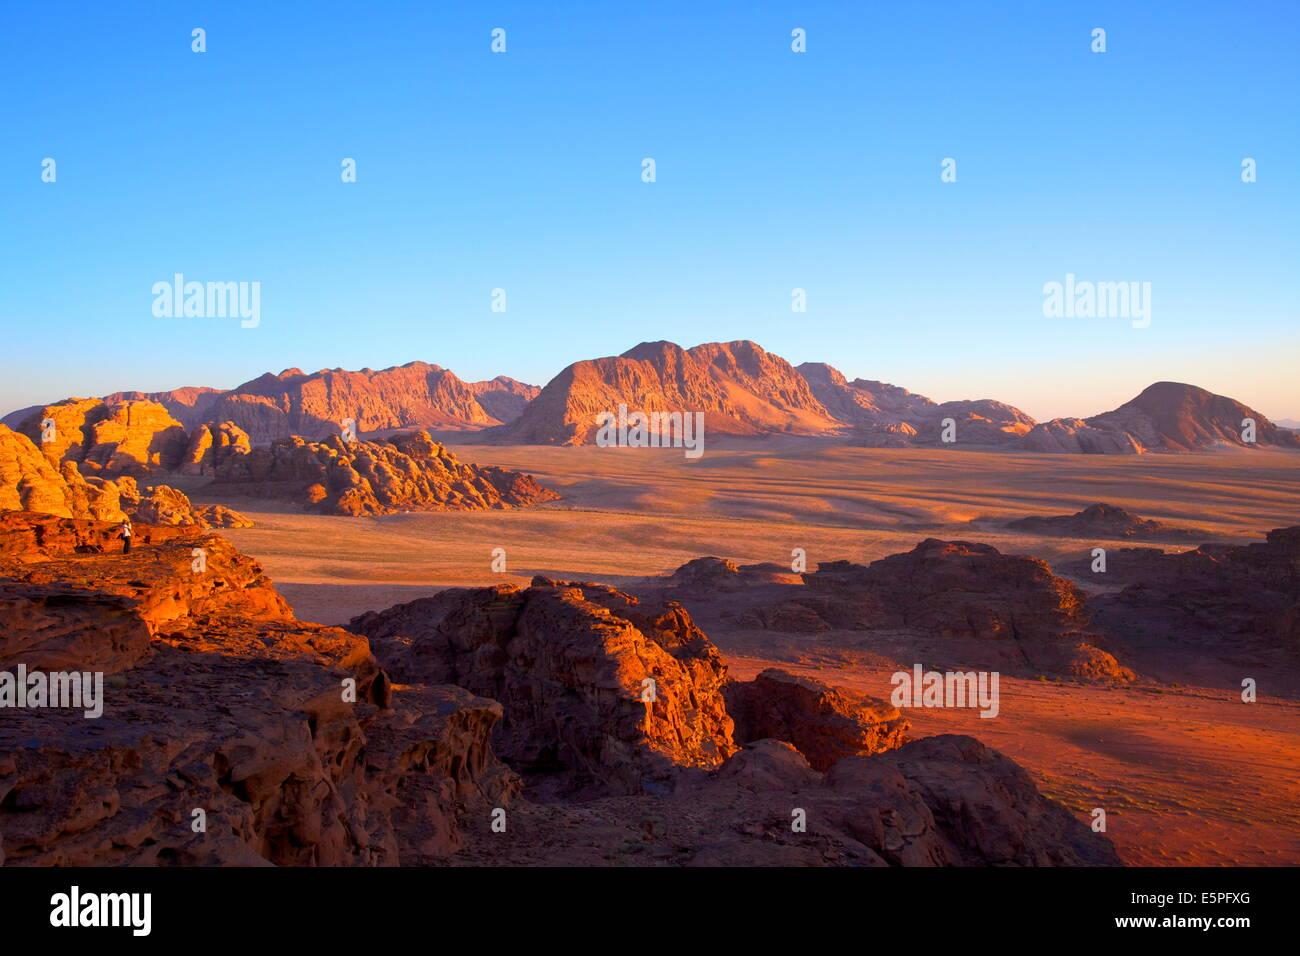 Tourist in Wadi Rum, Jordanien, Naher Osten Stockbild